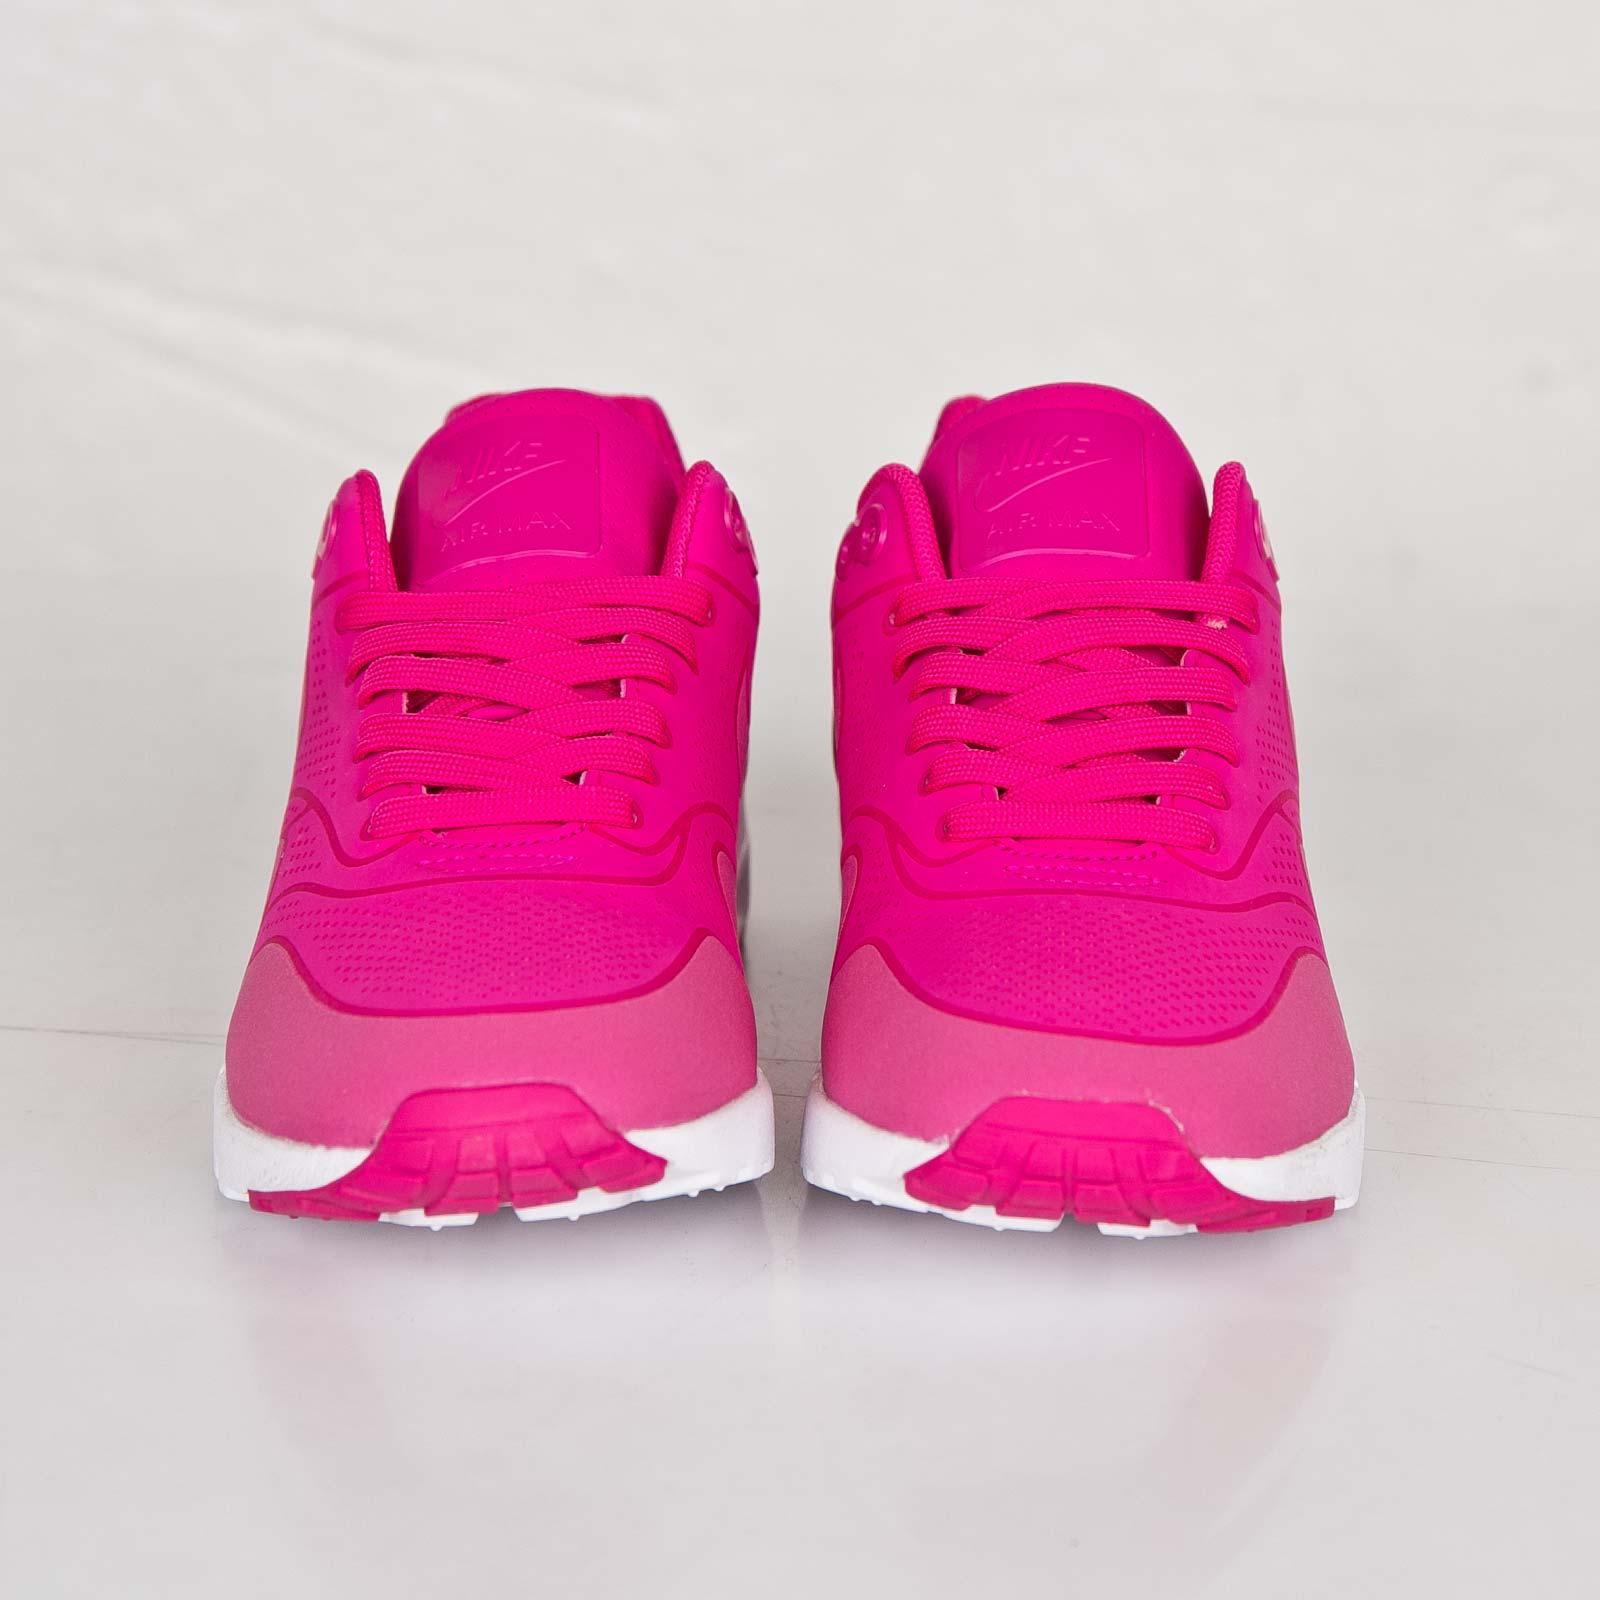 super popular b0a4f 25ea2 Nike Wmns Air Max 1 Ultra Moire - 704995-601 - Sneakersnstuff   sneakers   streetwear  online since 1999